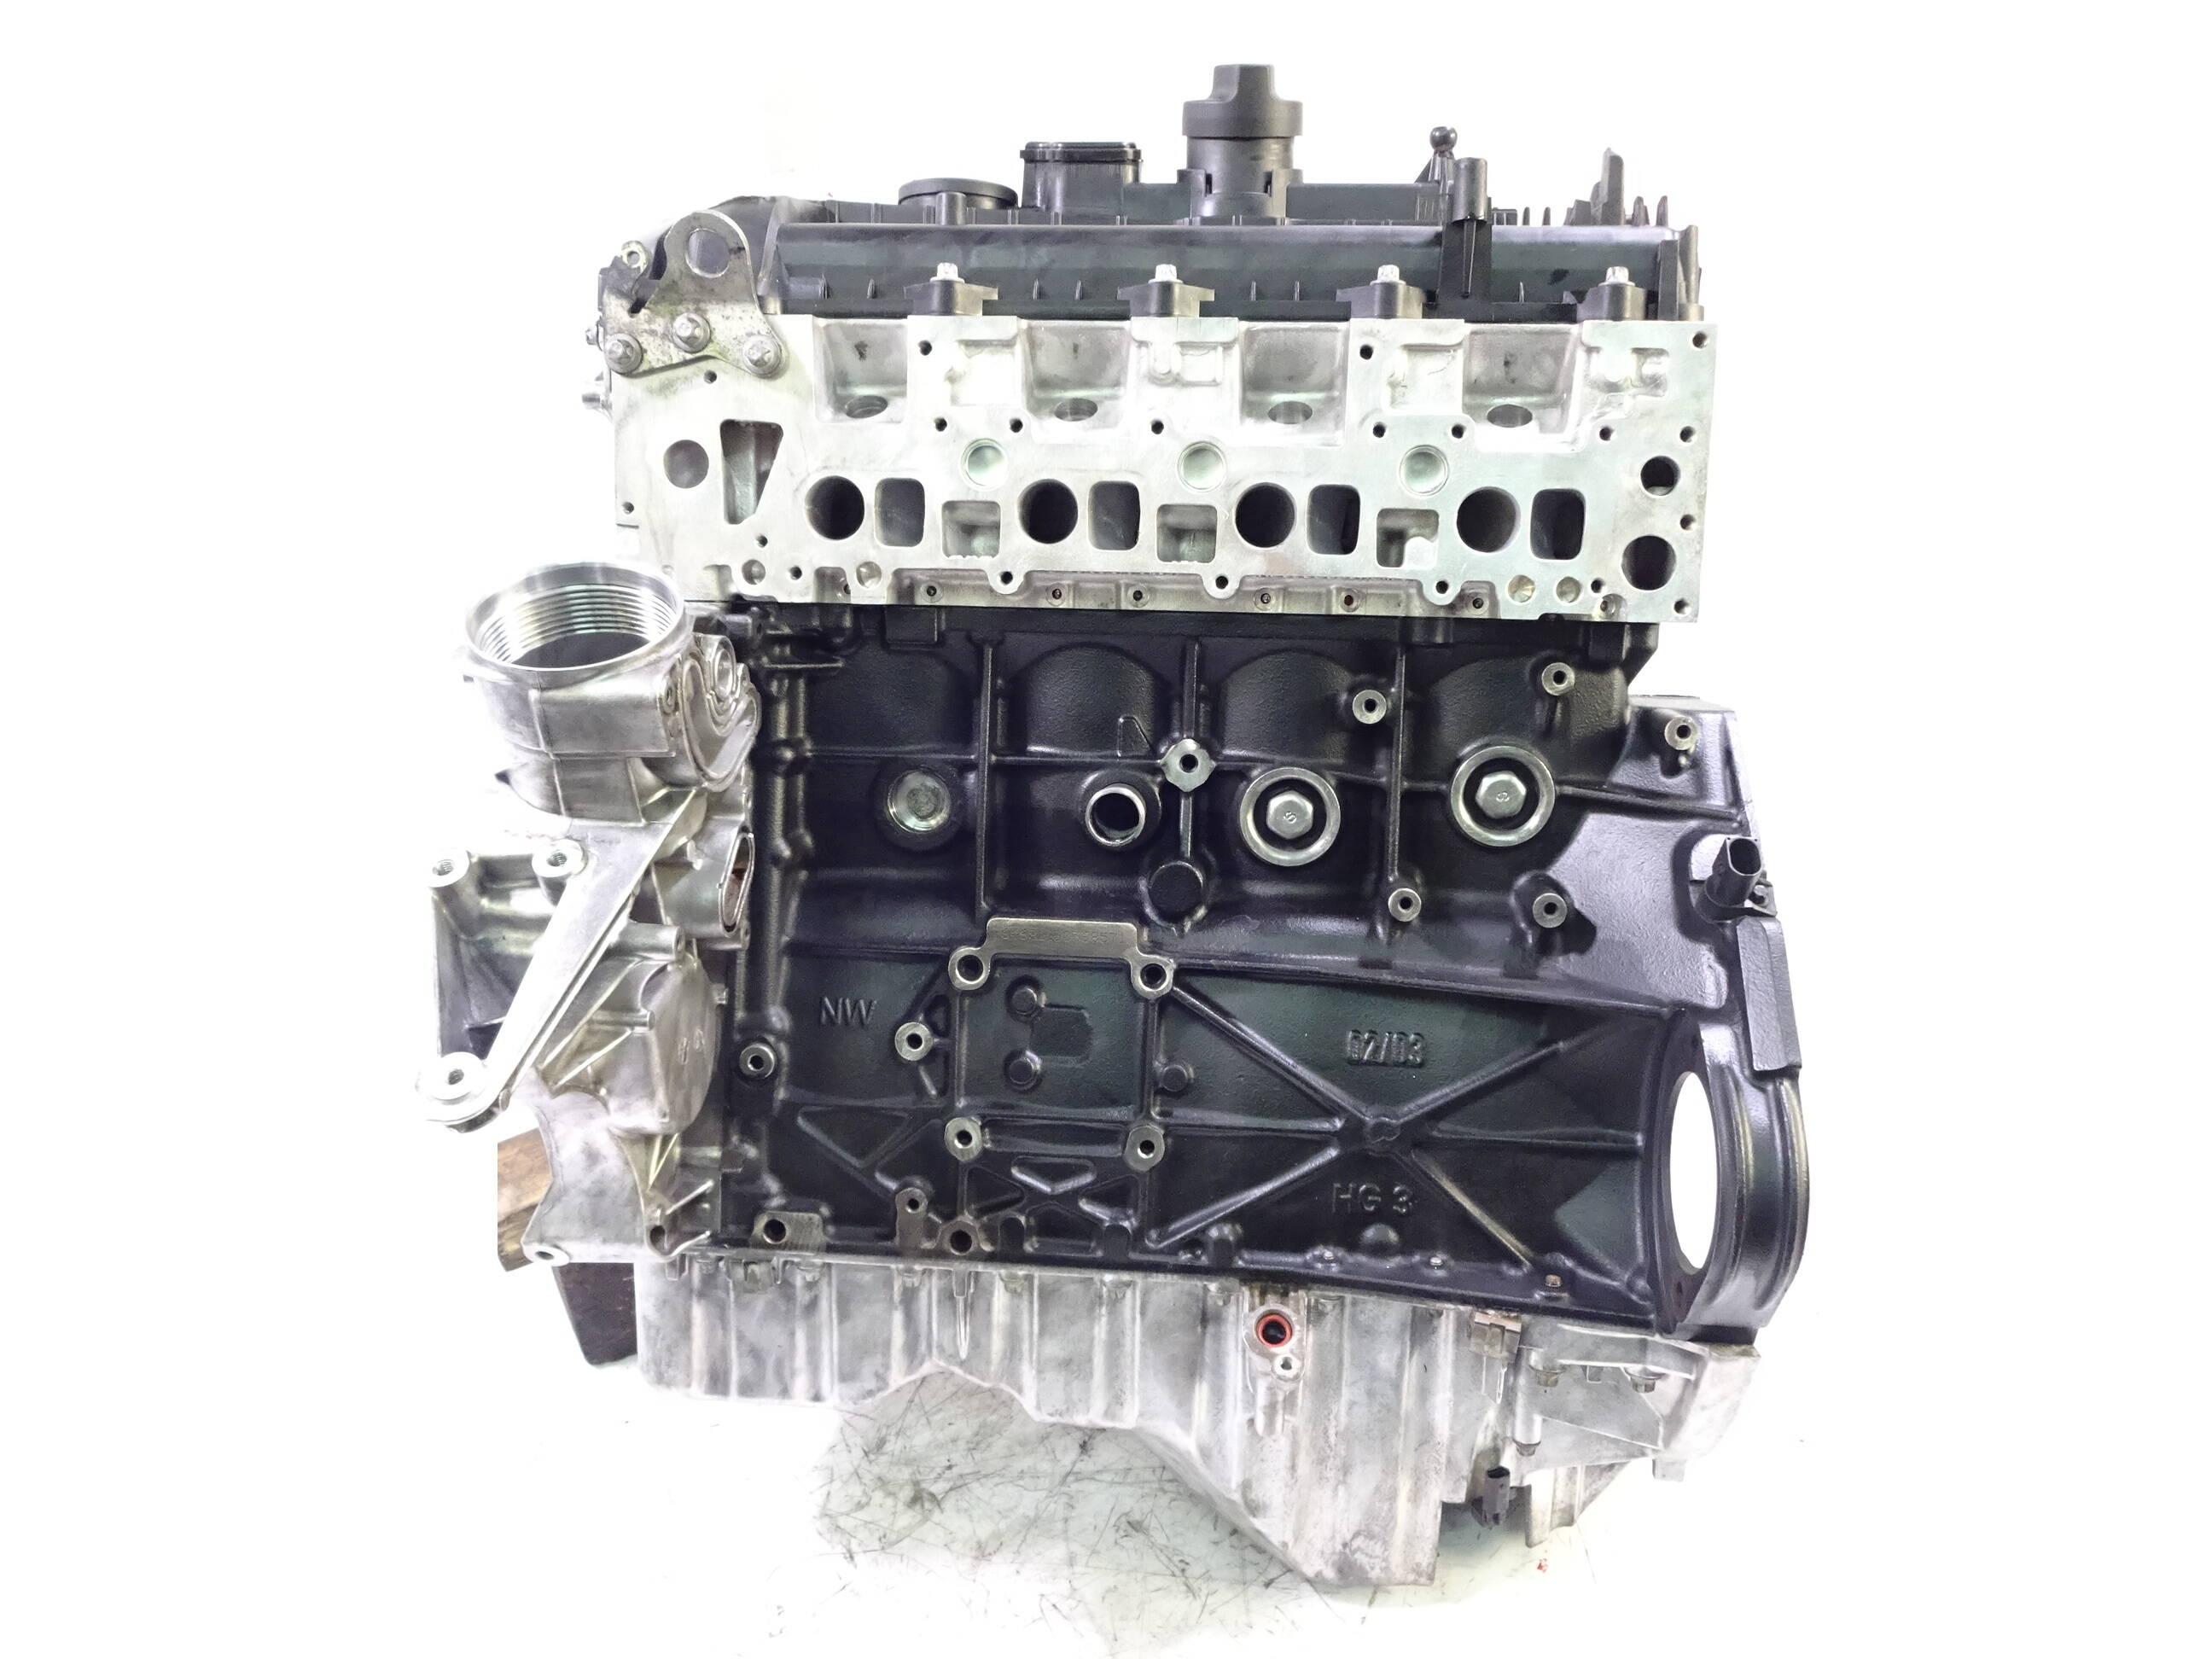 Motor 2008 Mercedes Benz S204 W204 2,2 CDI 646.811 Kopf geplant Dichtung NEU